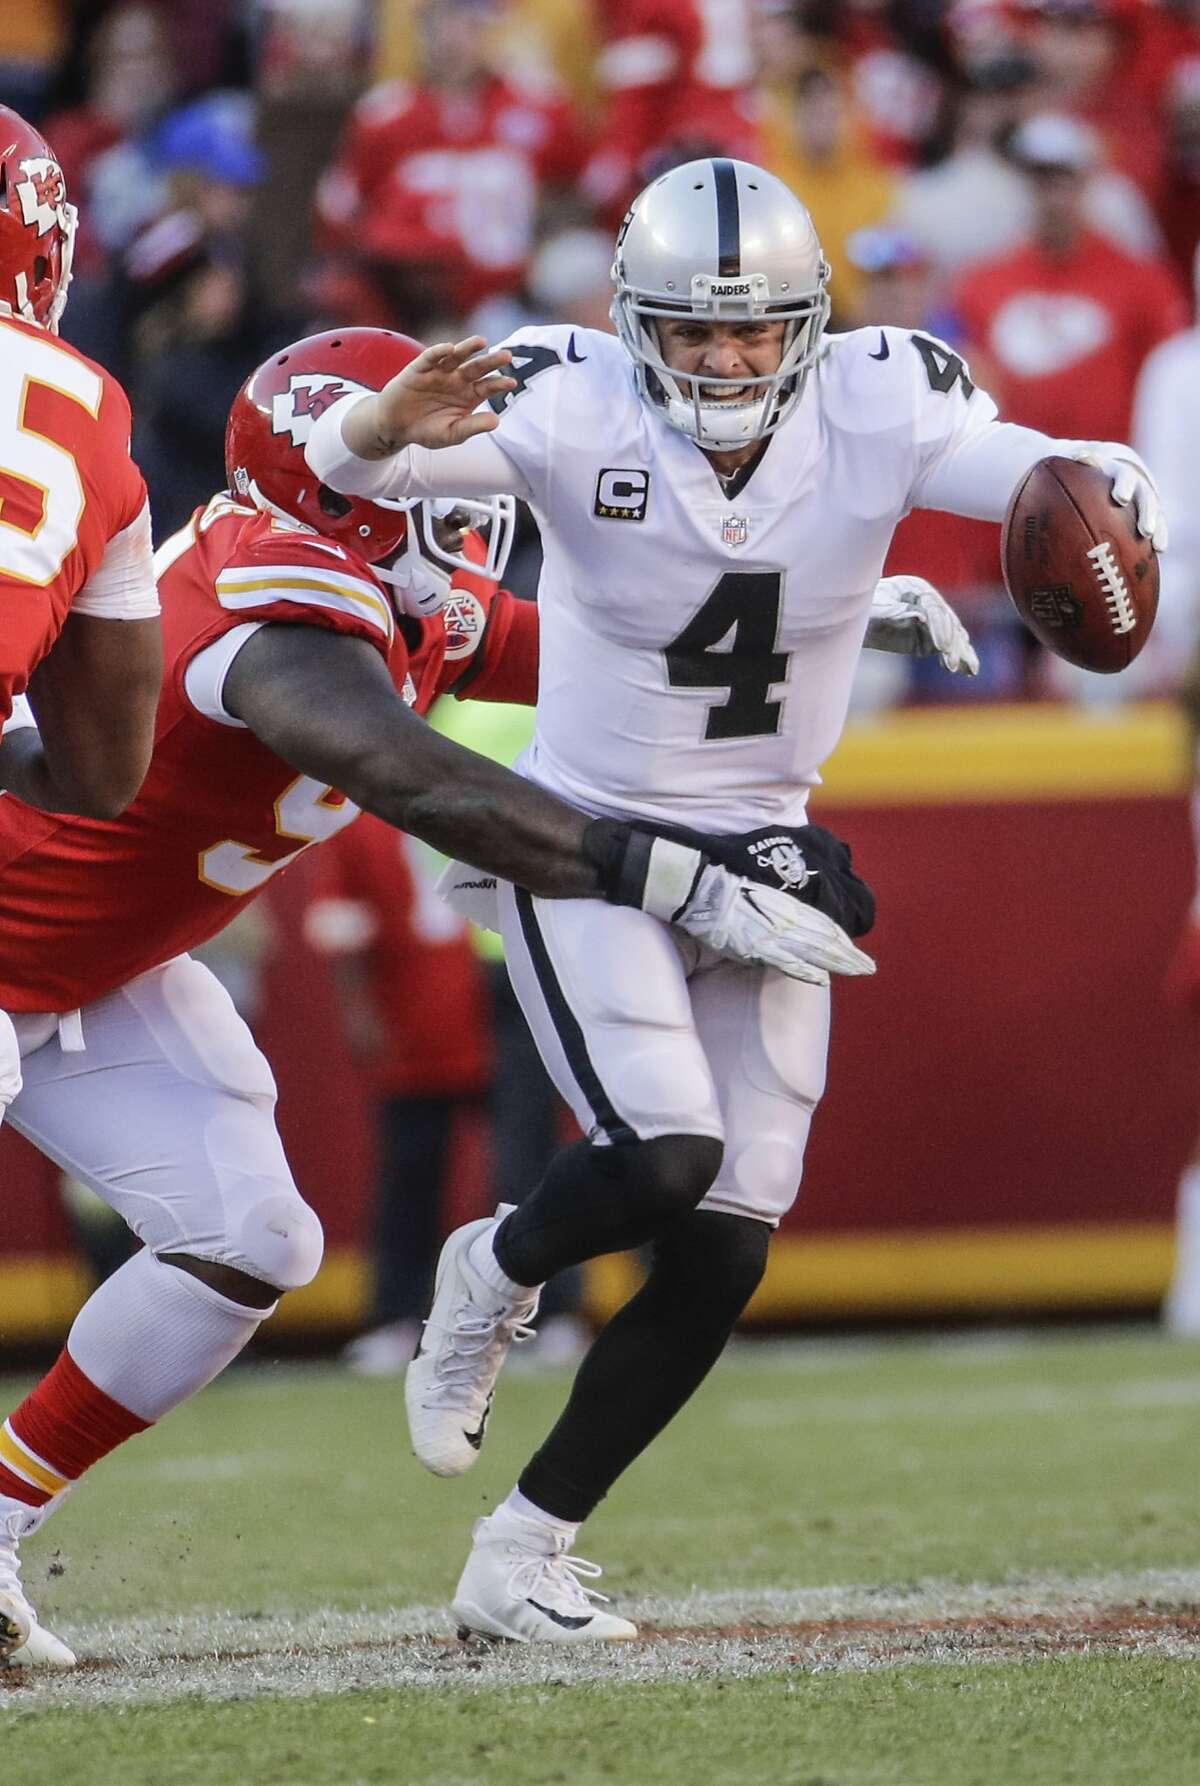 Kansas City Chiefs defensive lineman Rakeem Nunez-Roches (99) sacks Oakland Raiders quarterback Derek Carr (4) during the second half of an NFL football game in Kansas City, Mo., Sunday, Dec. 10, 2017. (AP Photo/Charlie Riedel)